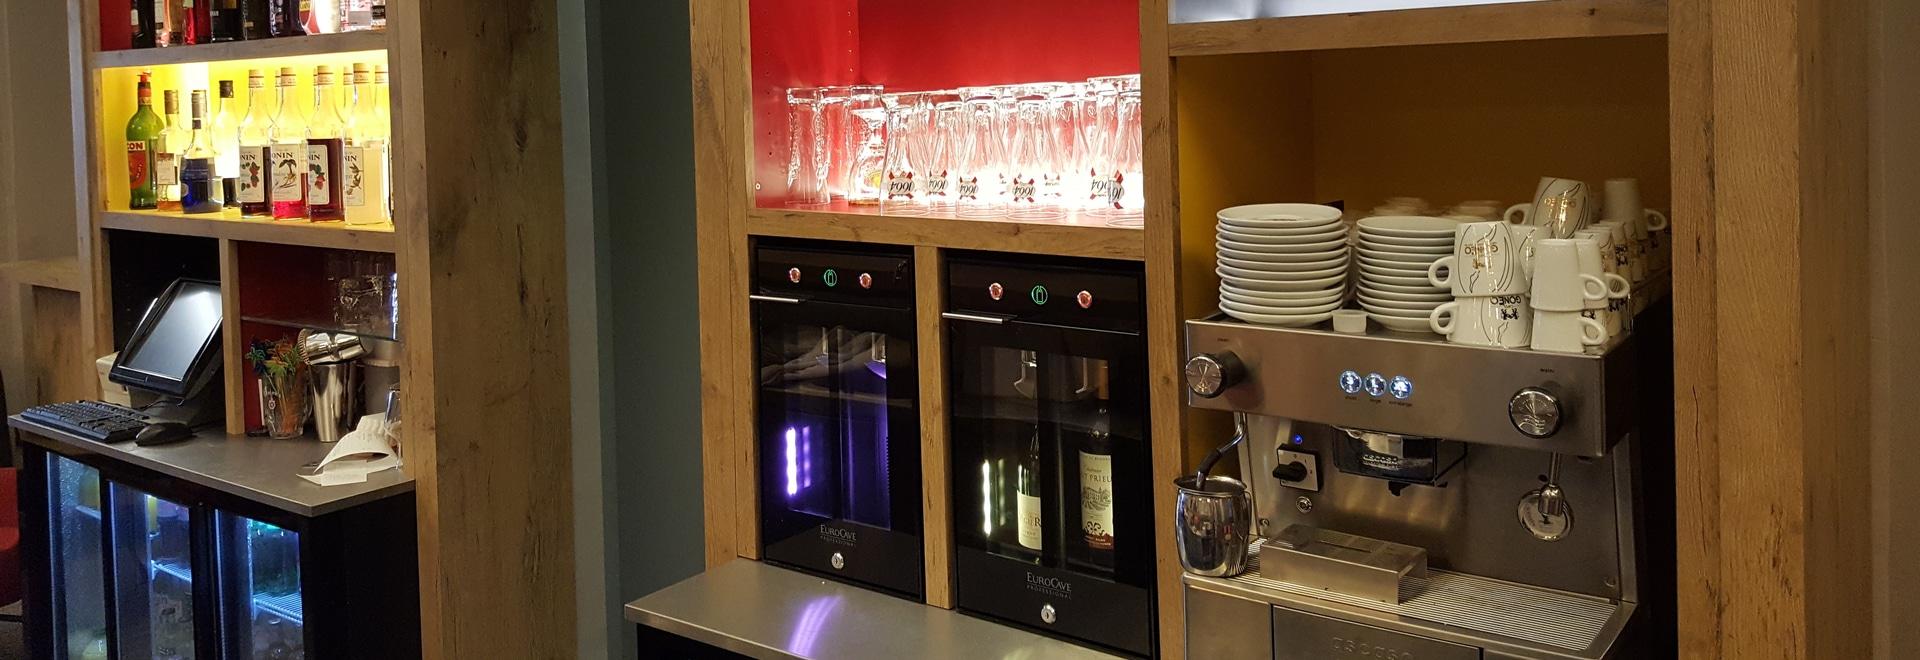 Wine Bar 2.0 - Ibis Hotel - Perrache Lyon